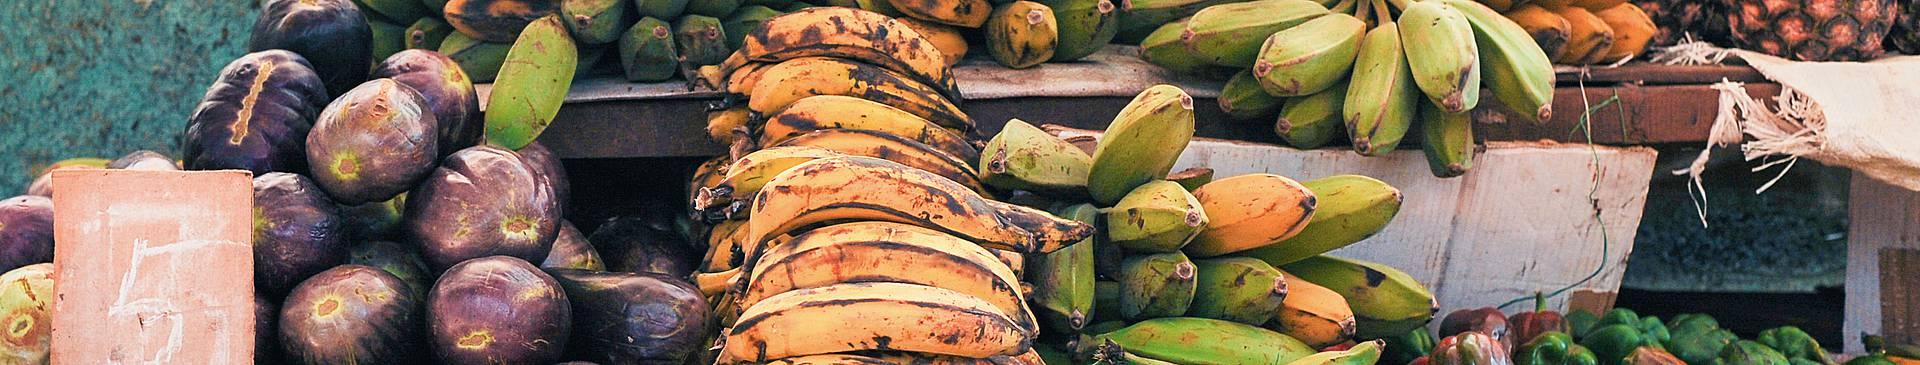 Kulinarische Reisen Kuba